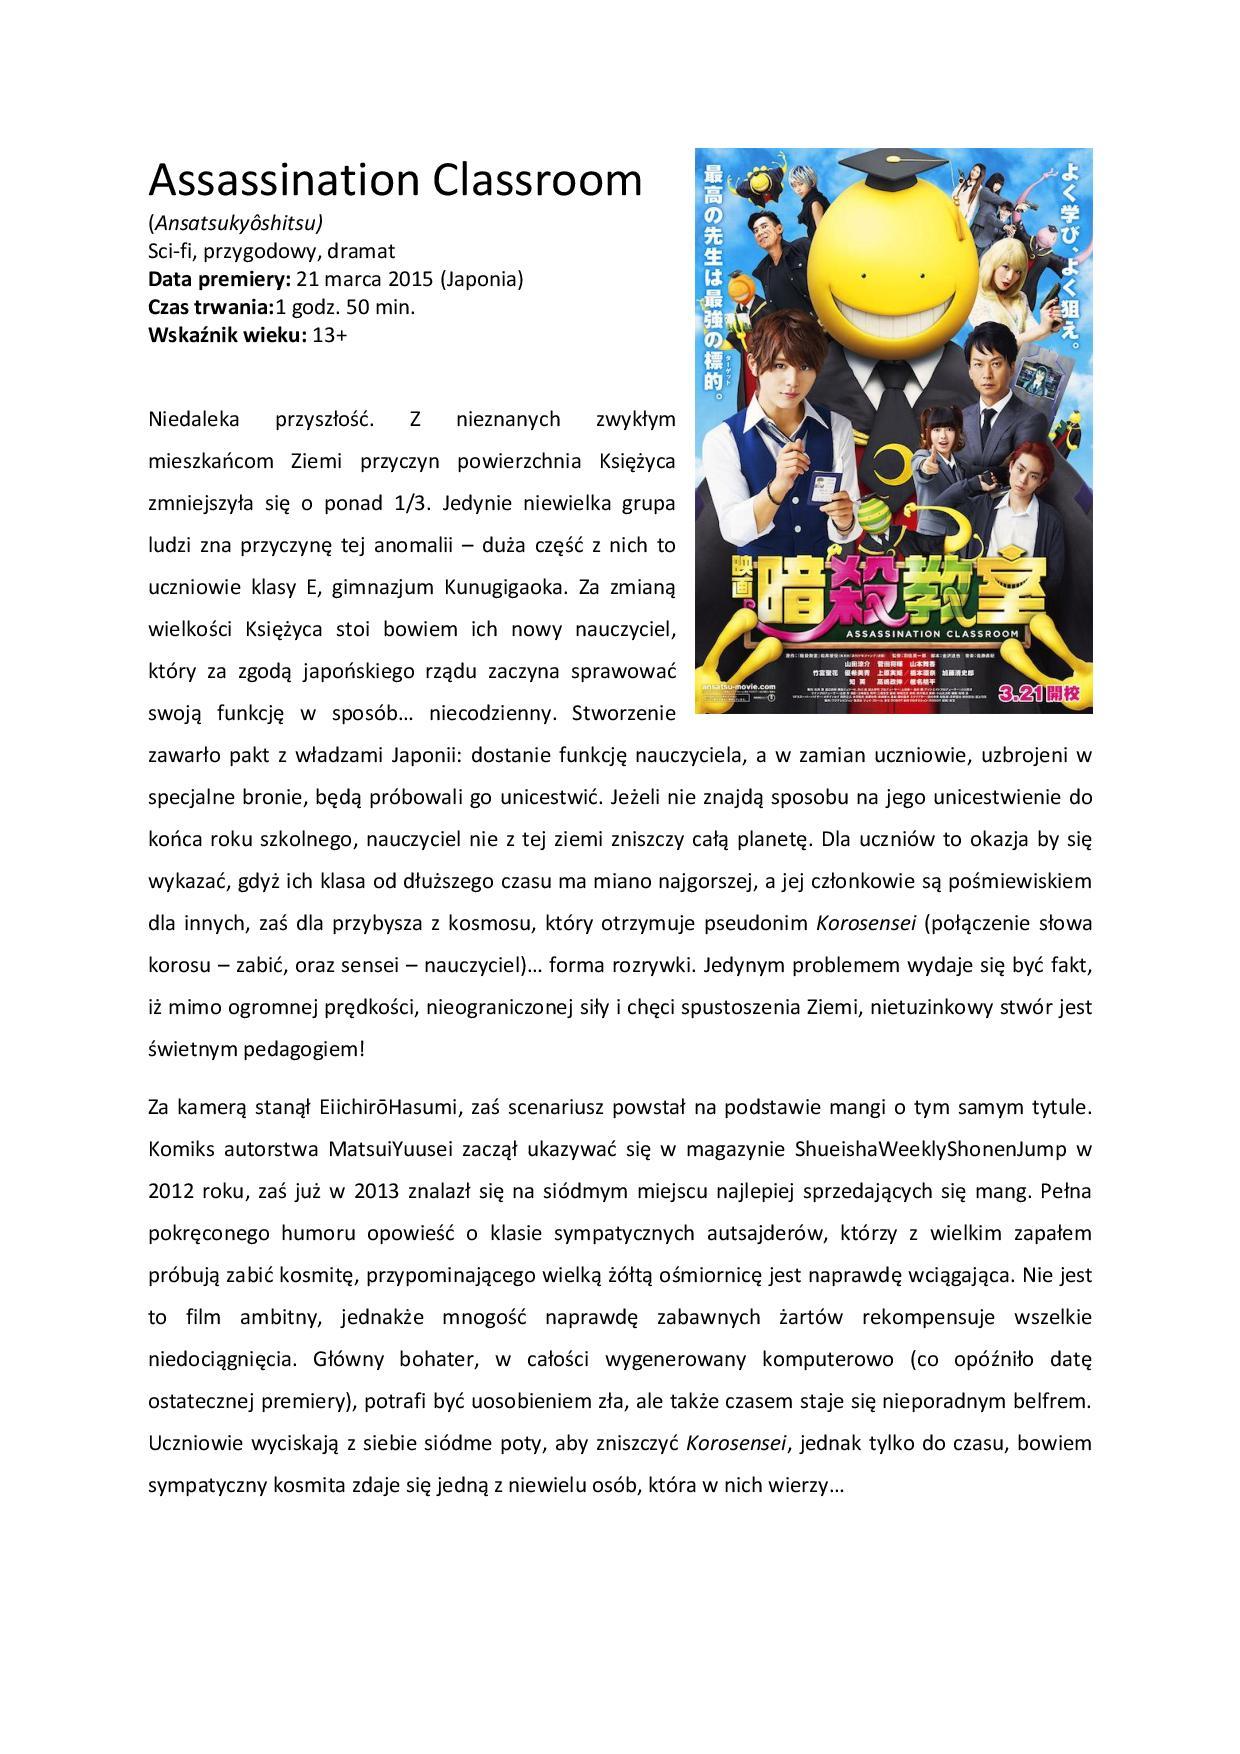 Assasination-Classroom-recenzja-page-001